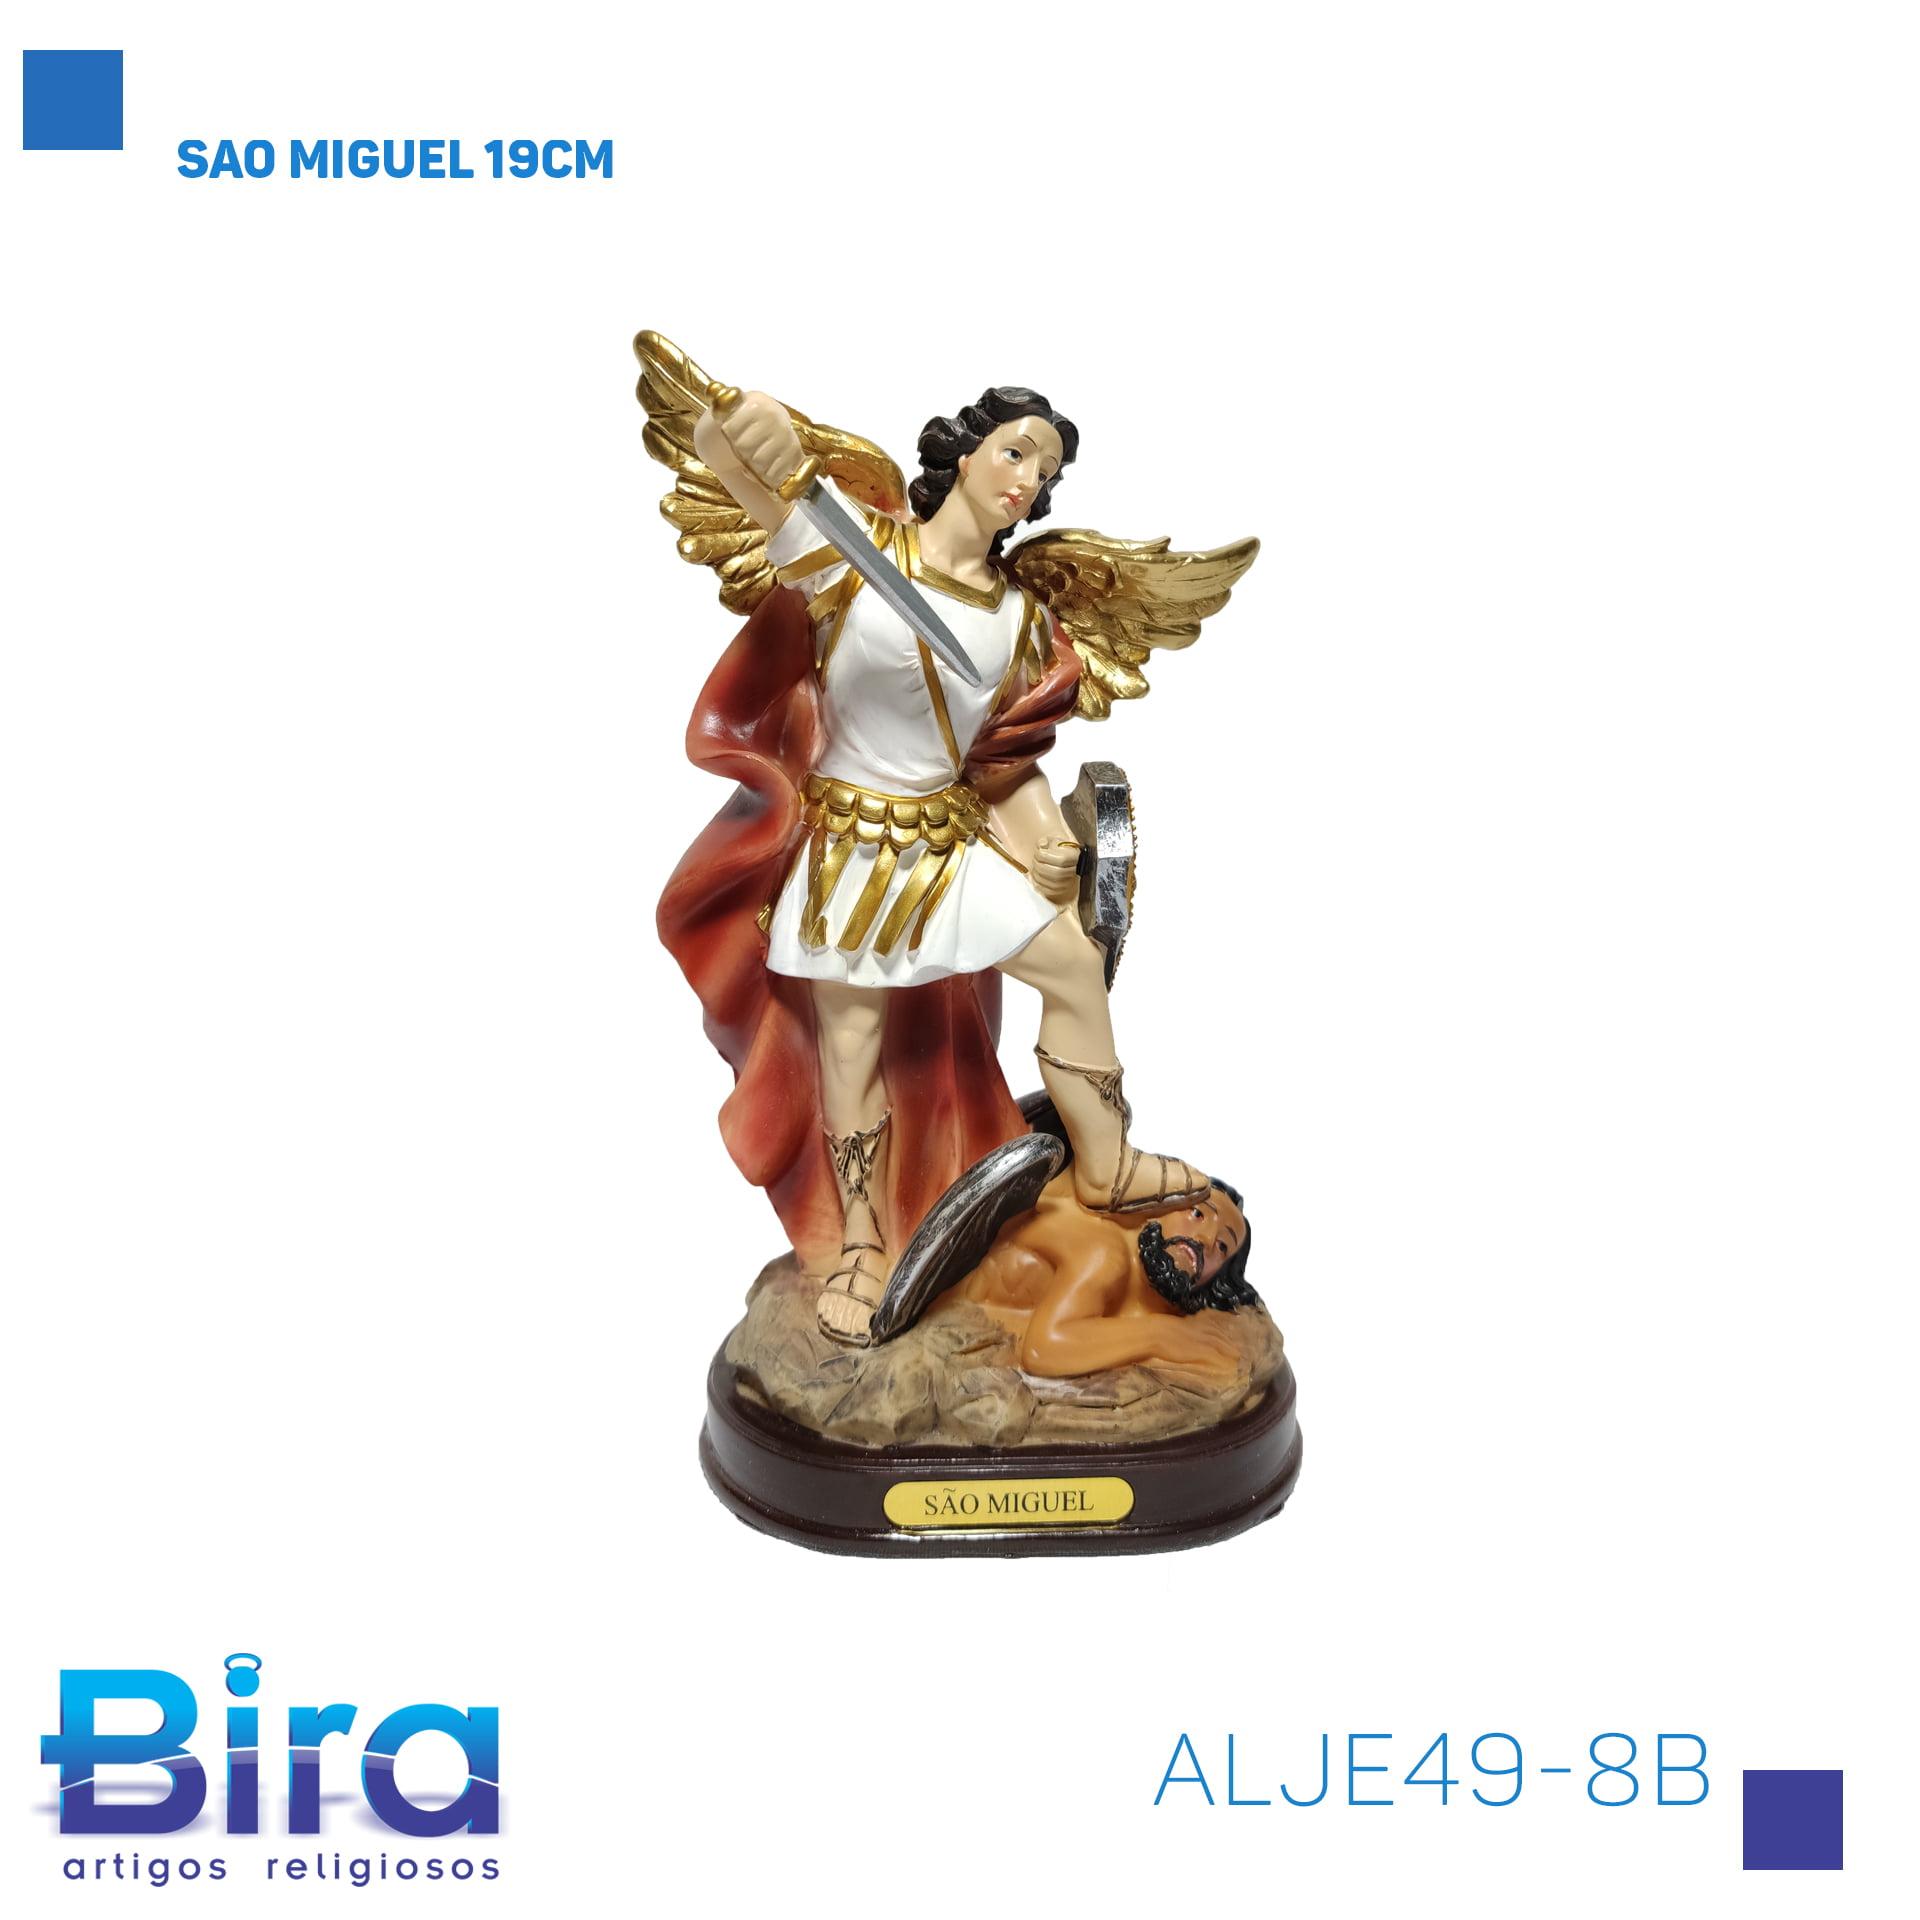 Bira Artigos Religiosos - SAO MIGUEL 19CM B86 Cód. ALJE49-8B